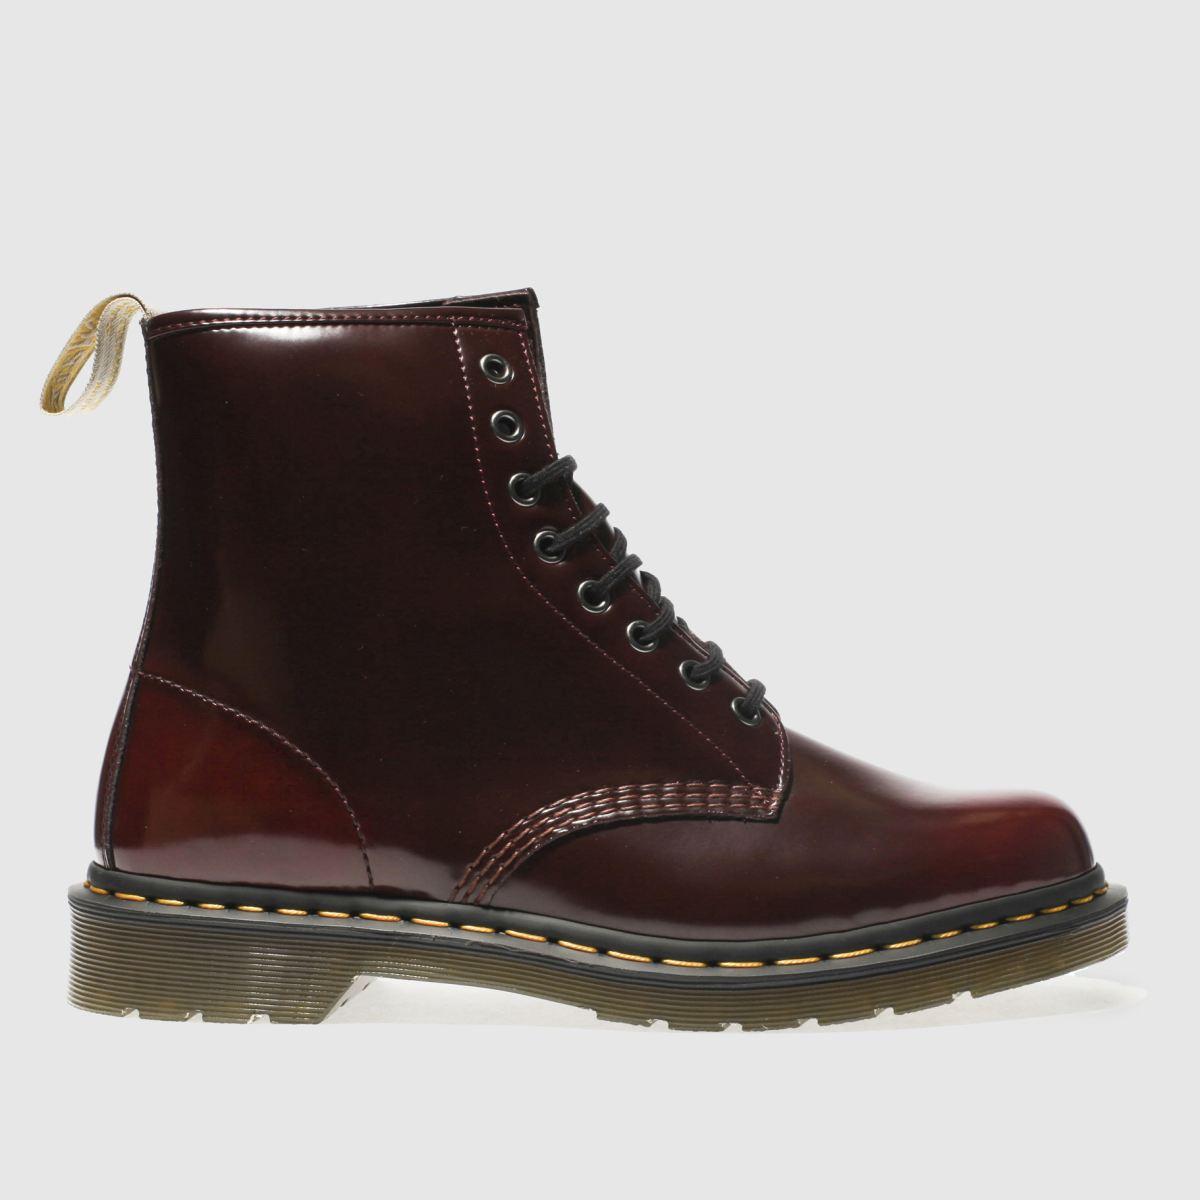 Dr Martens Burgundy Vegan 1460 8-eye Boots